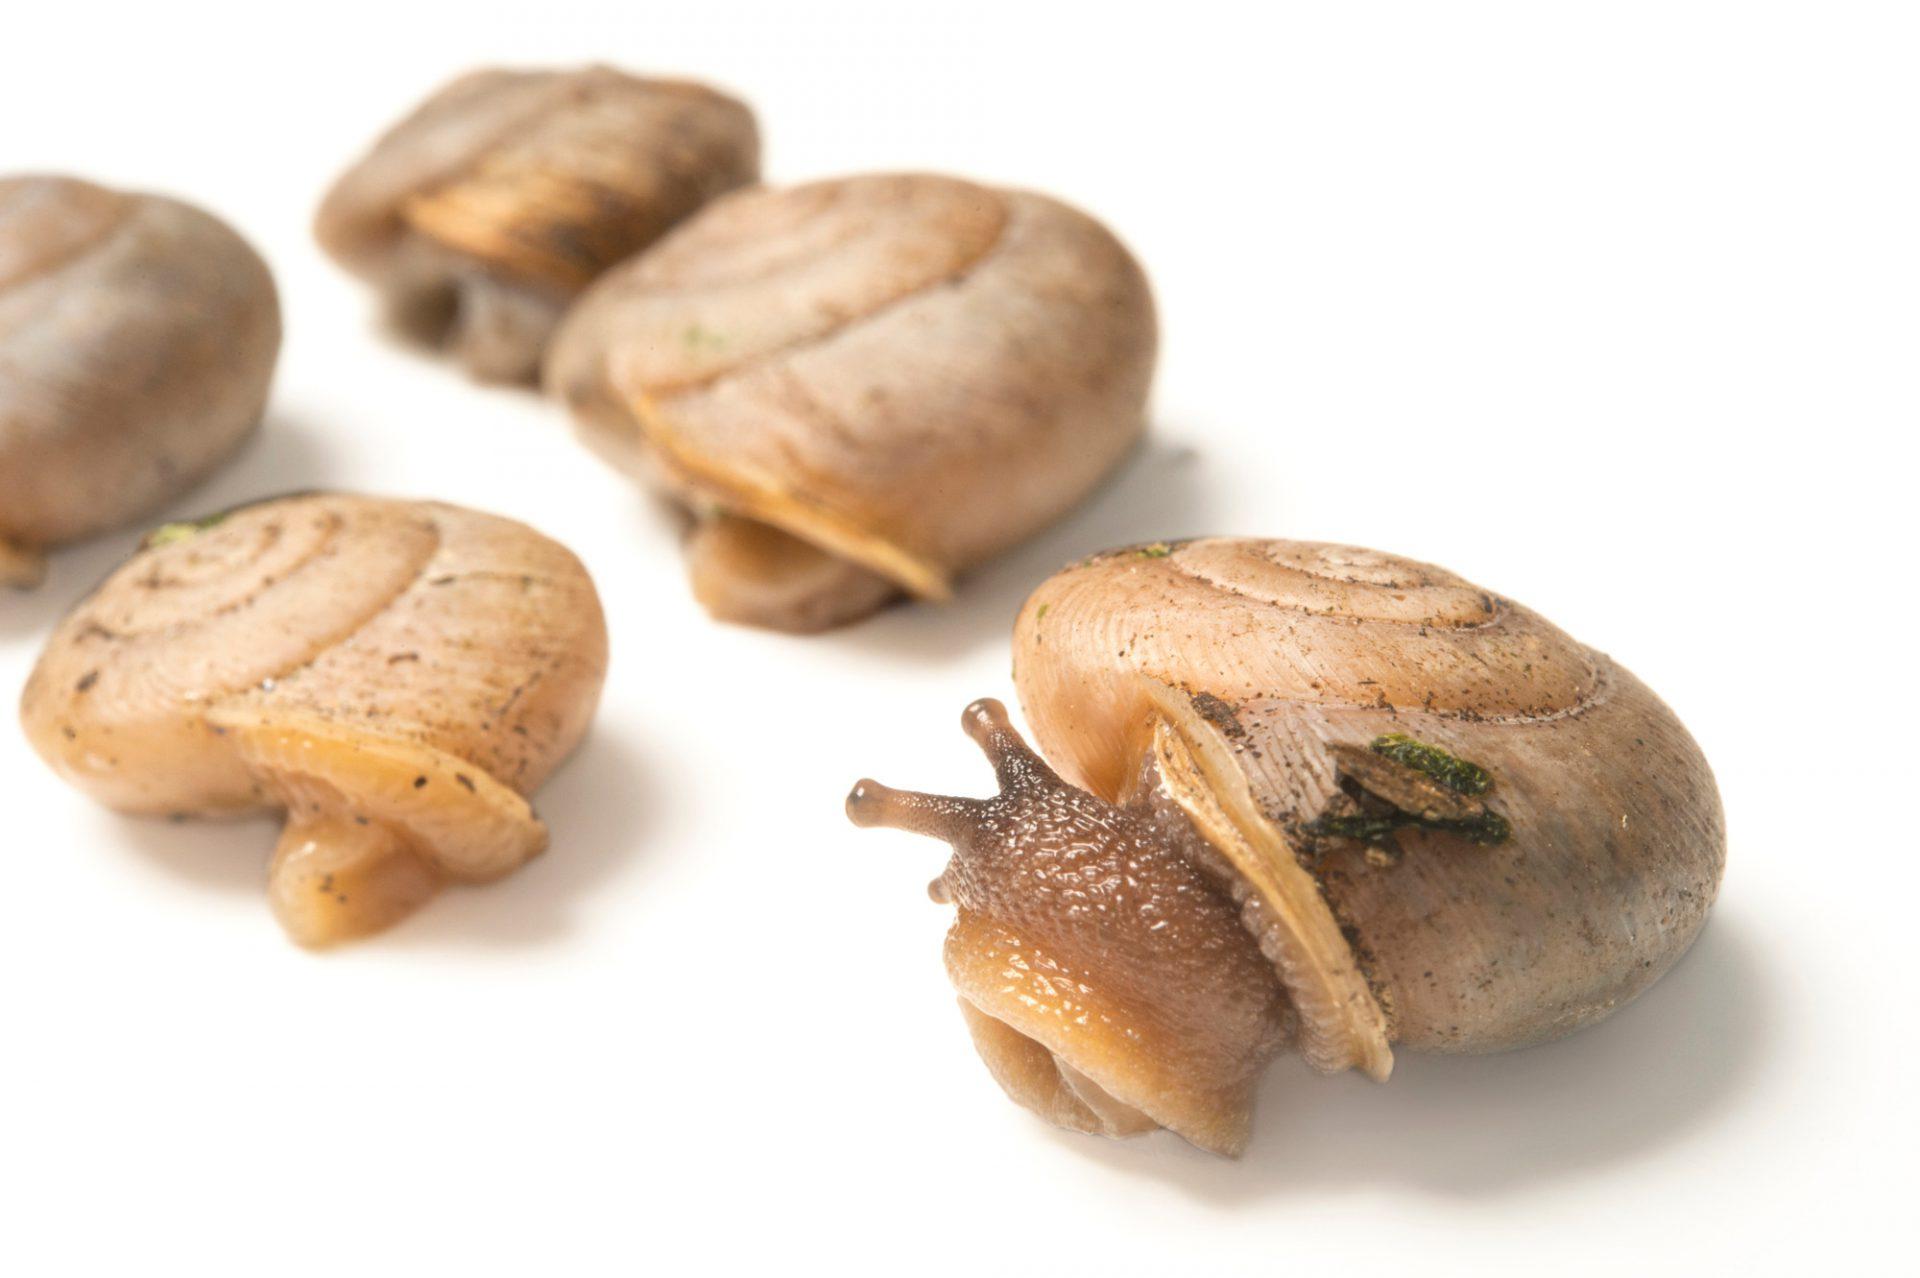 Photo: Garden snail (Cepaea) at the St. Louis Zoo.